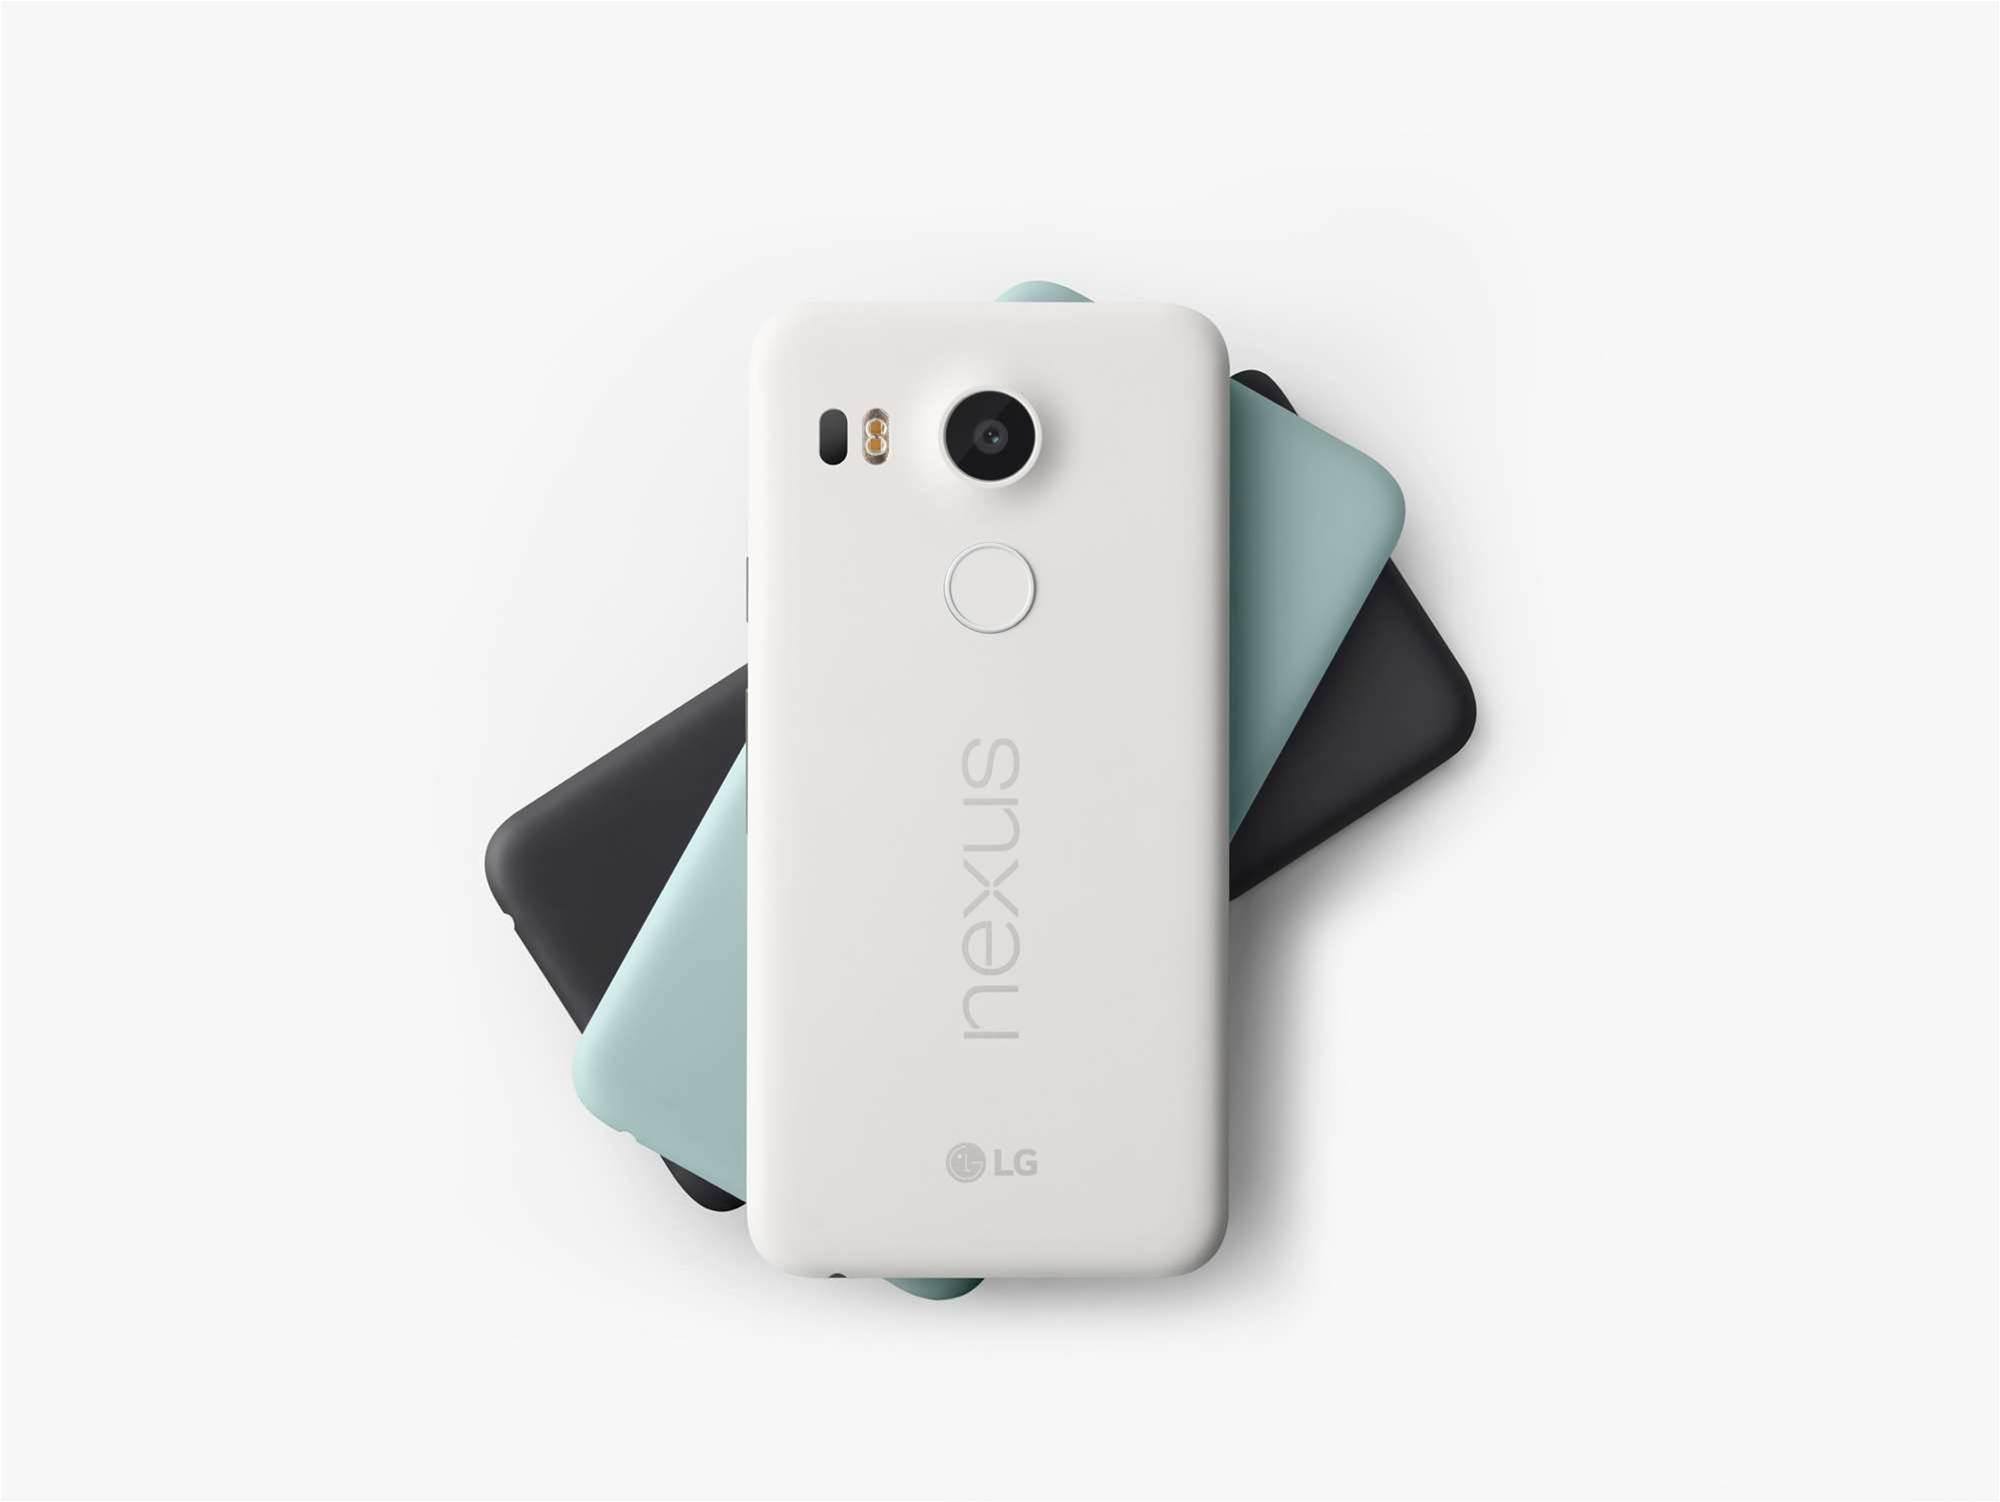 Nexus 5X and Nexus 6S land in Australia